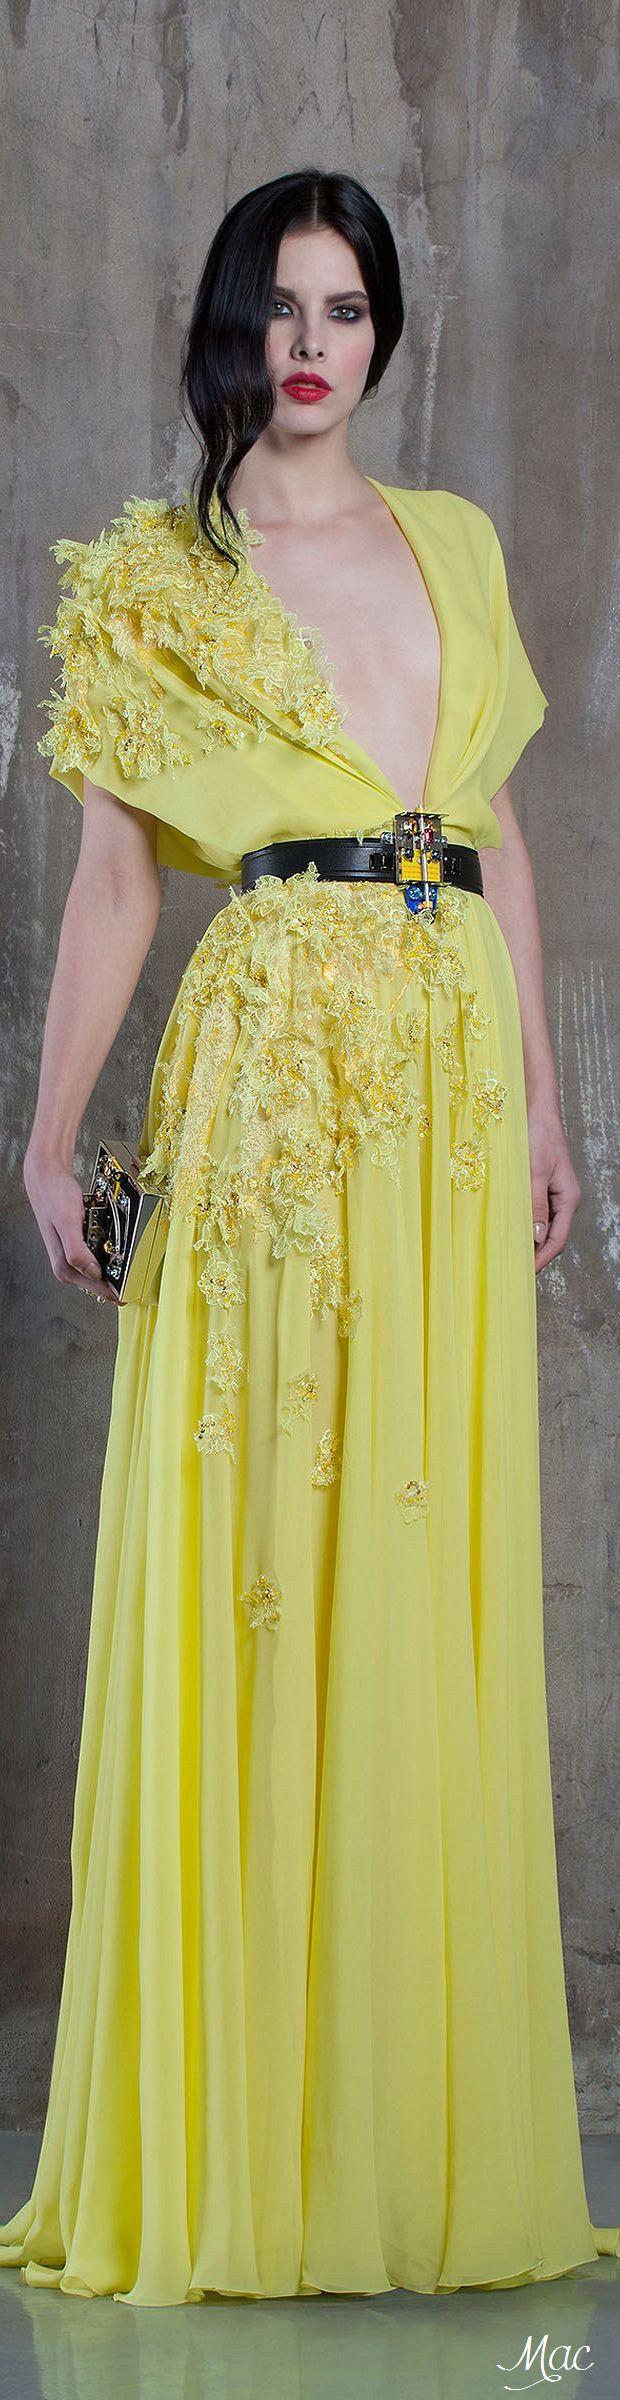 www.2locos.com Spring 2016 Haute Couture Basil Soda